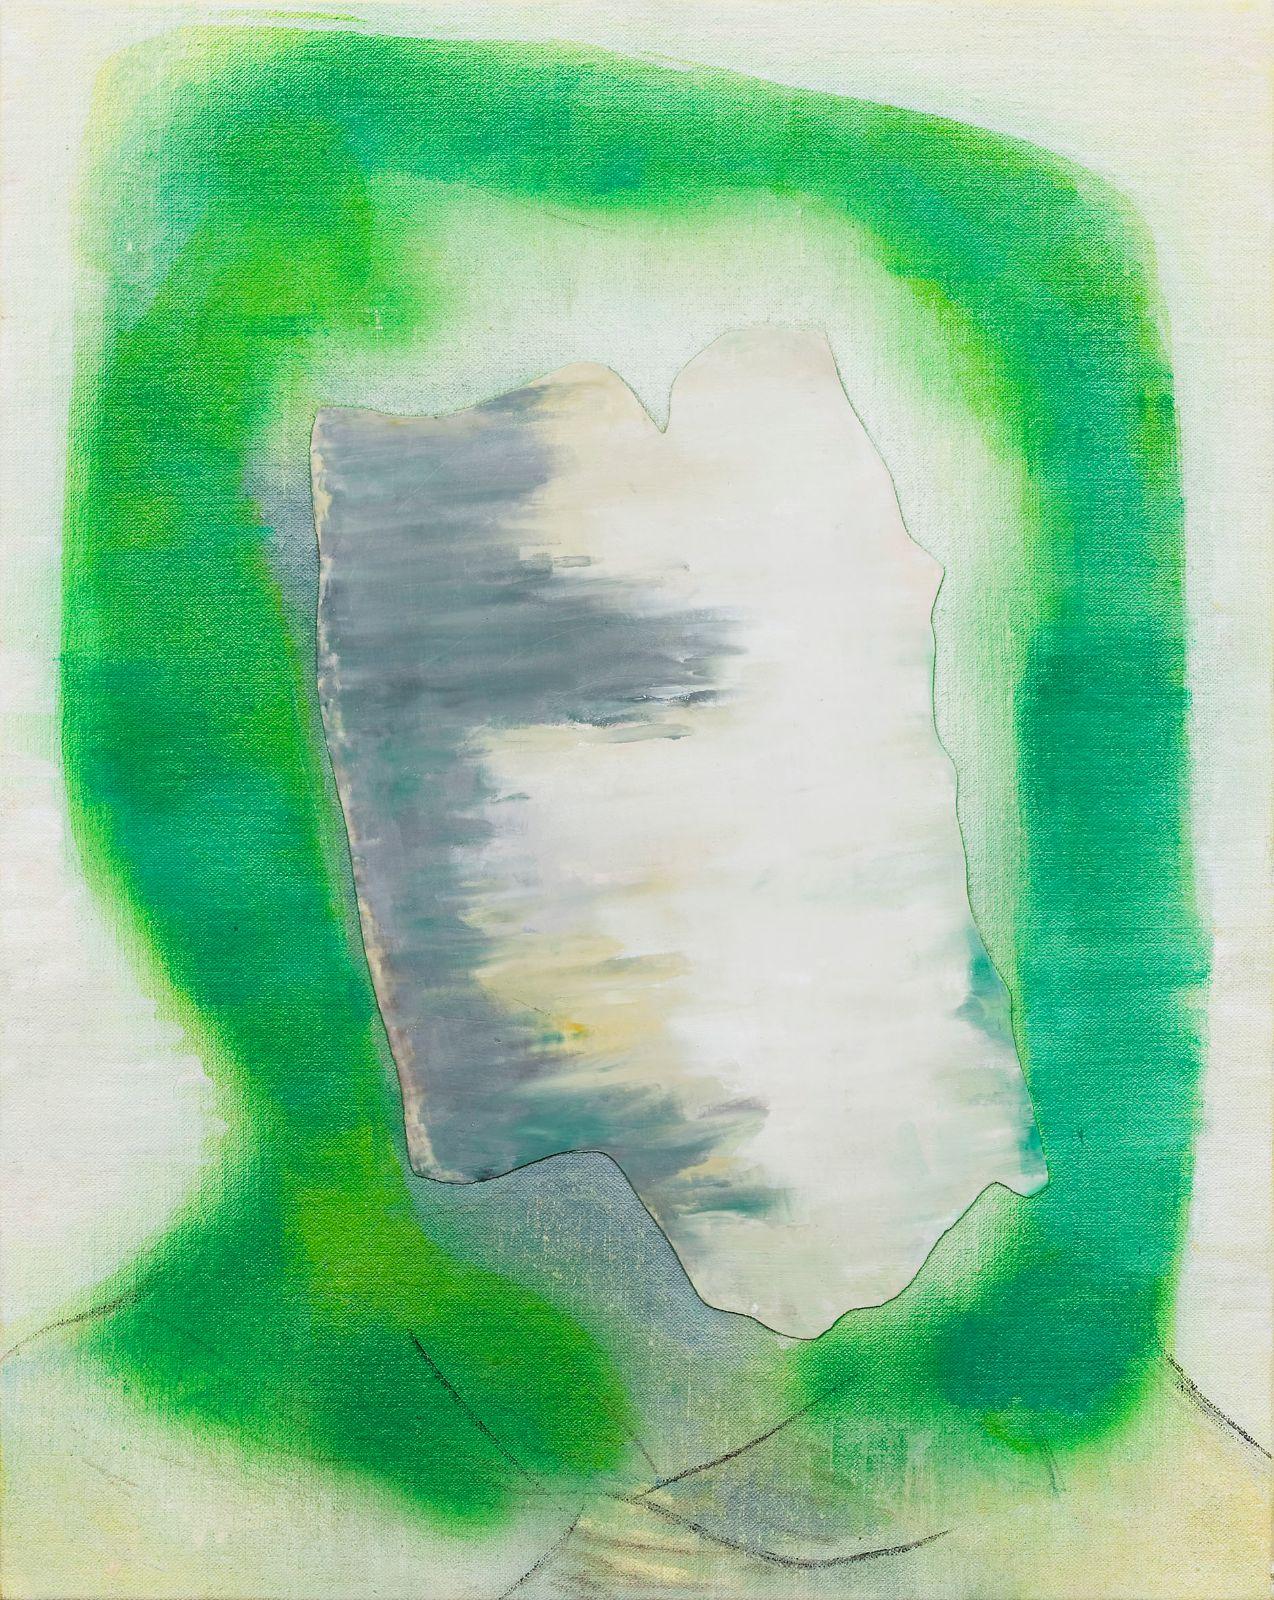 Ikon i grønt og hvitt, 2009, oil and acrylic on canvas on panel, 51 x 40.5 cm